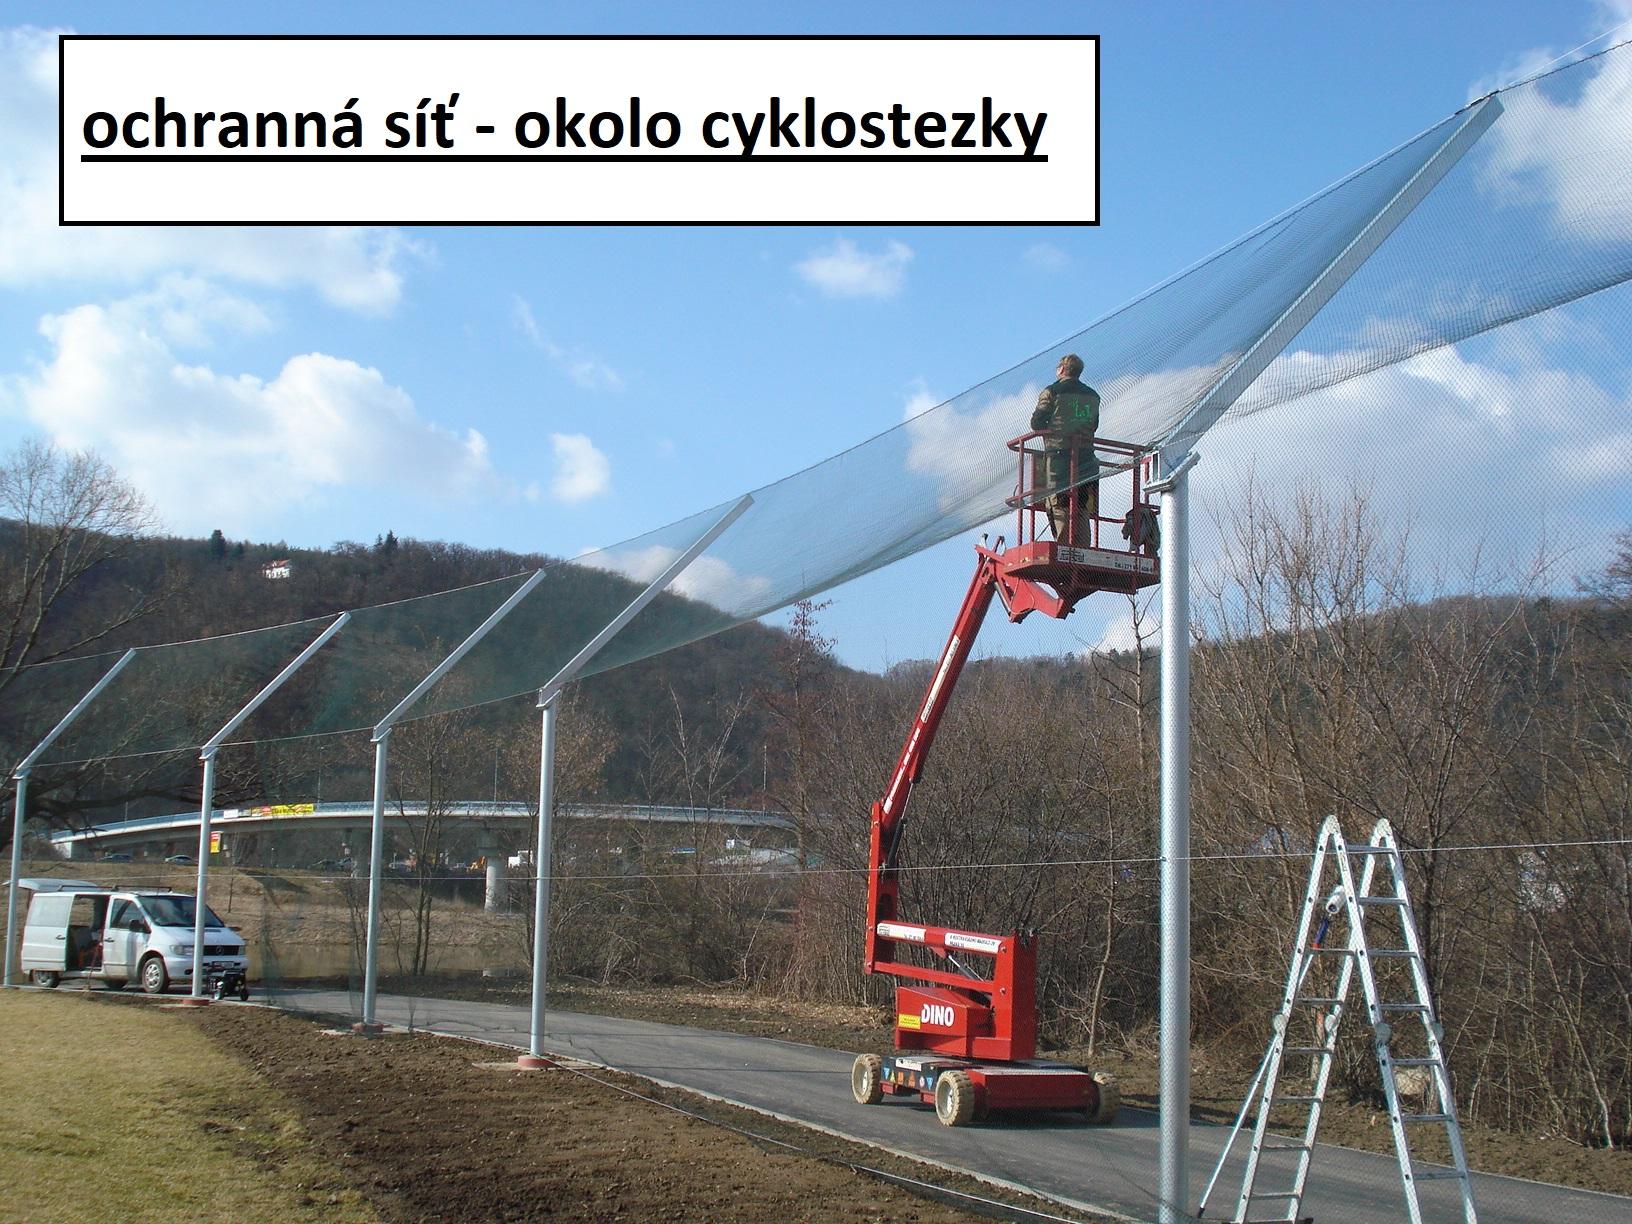 ochranná síť - okolí cyklostezsky